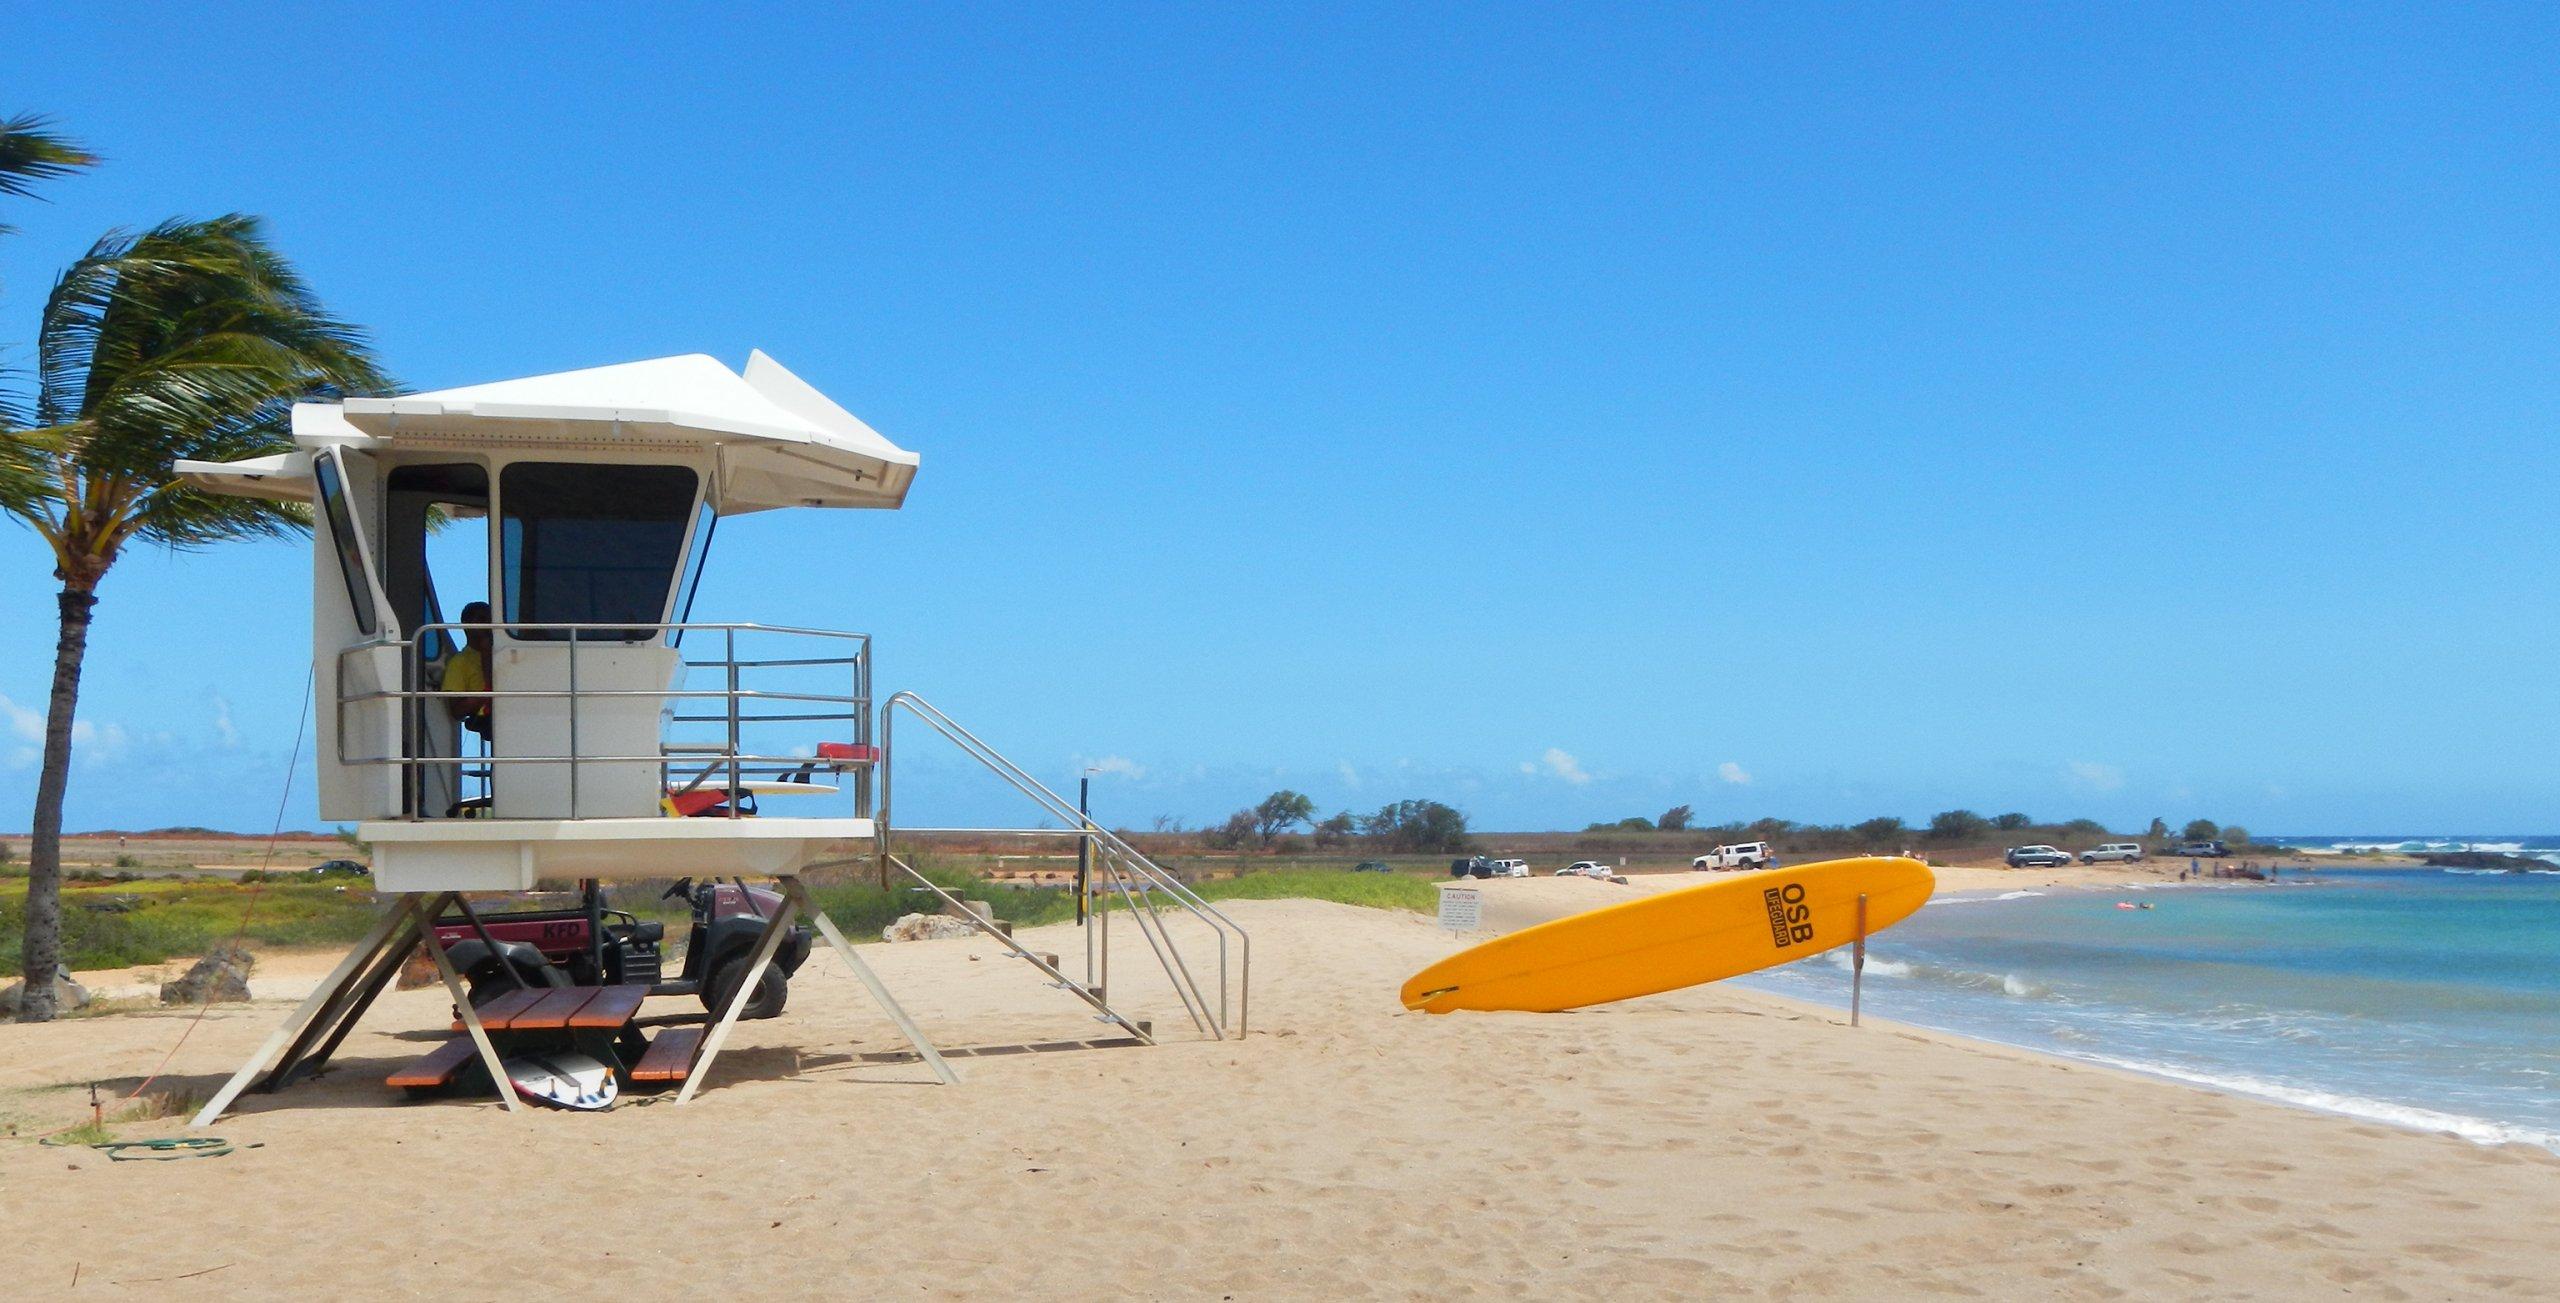 Lifeguard station at Hanapepe Salt Pond Beach Park